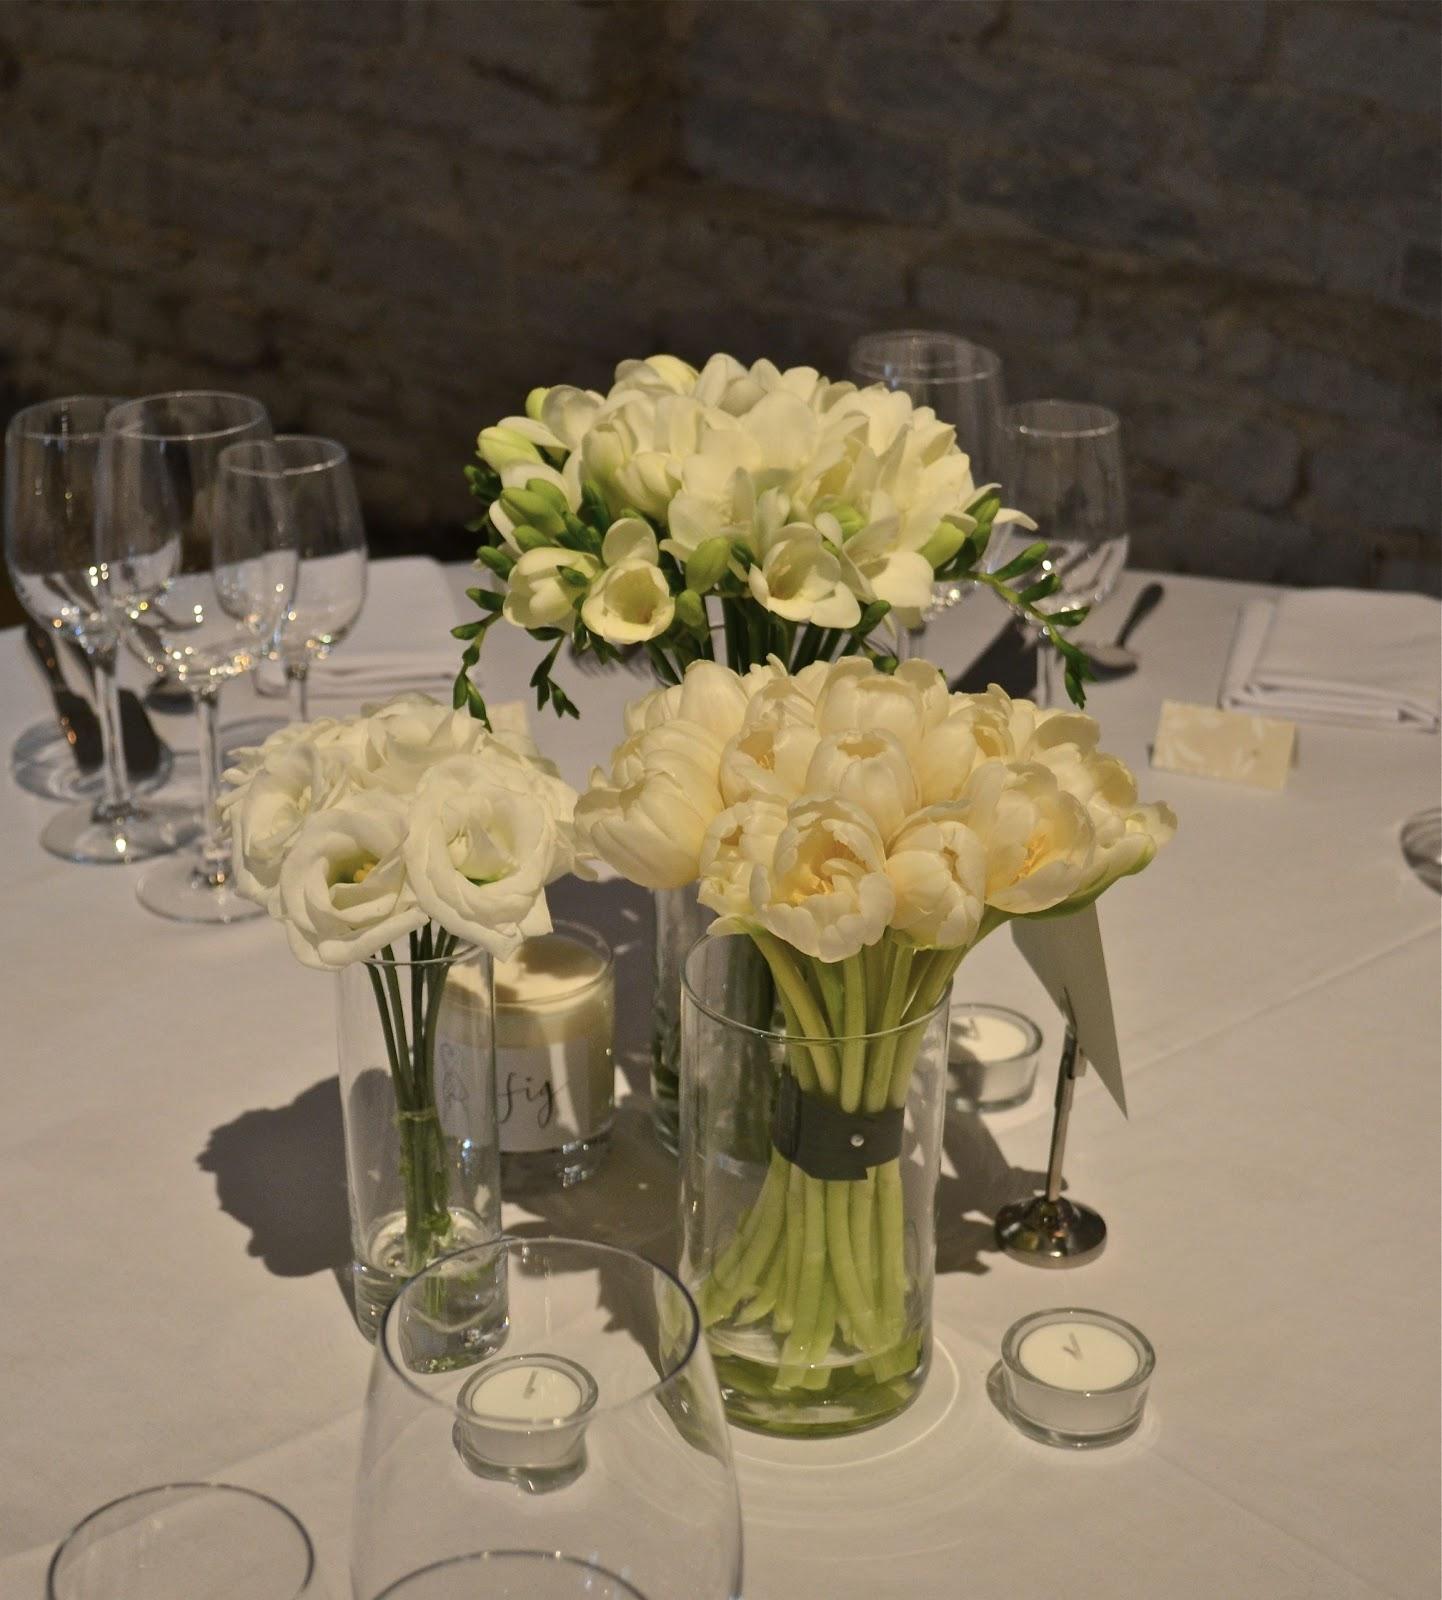 Winter Wedding Flowers Uk: Wedding Flowers Blog: Pamela's Winter White Wedding